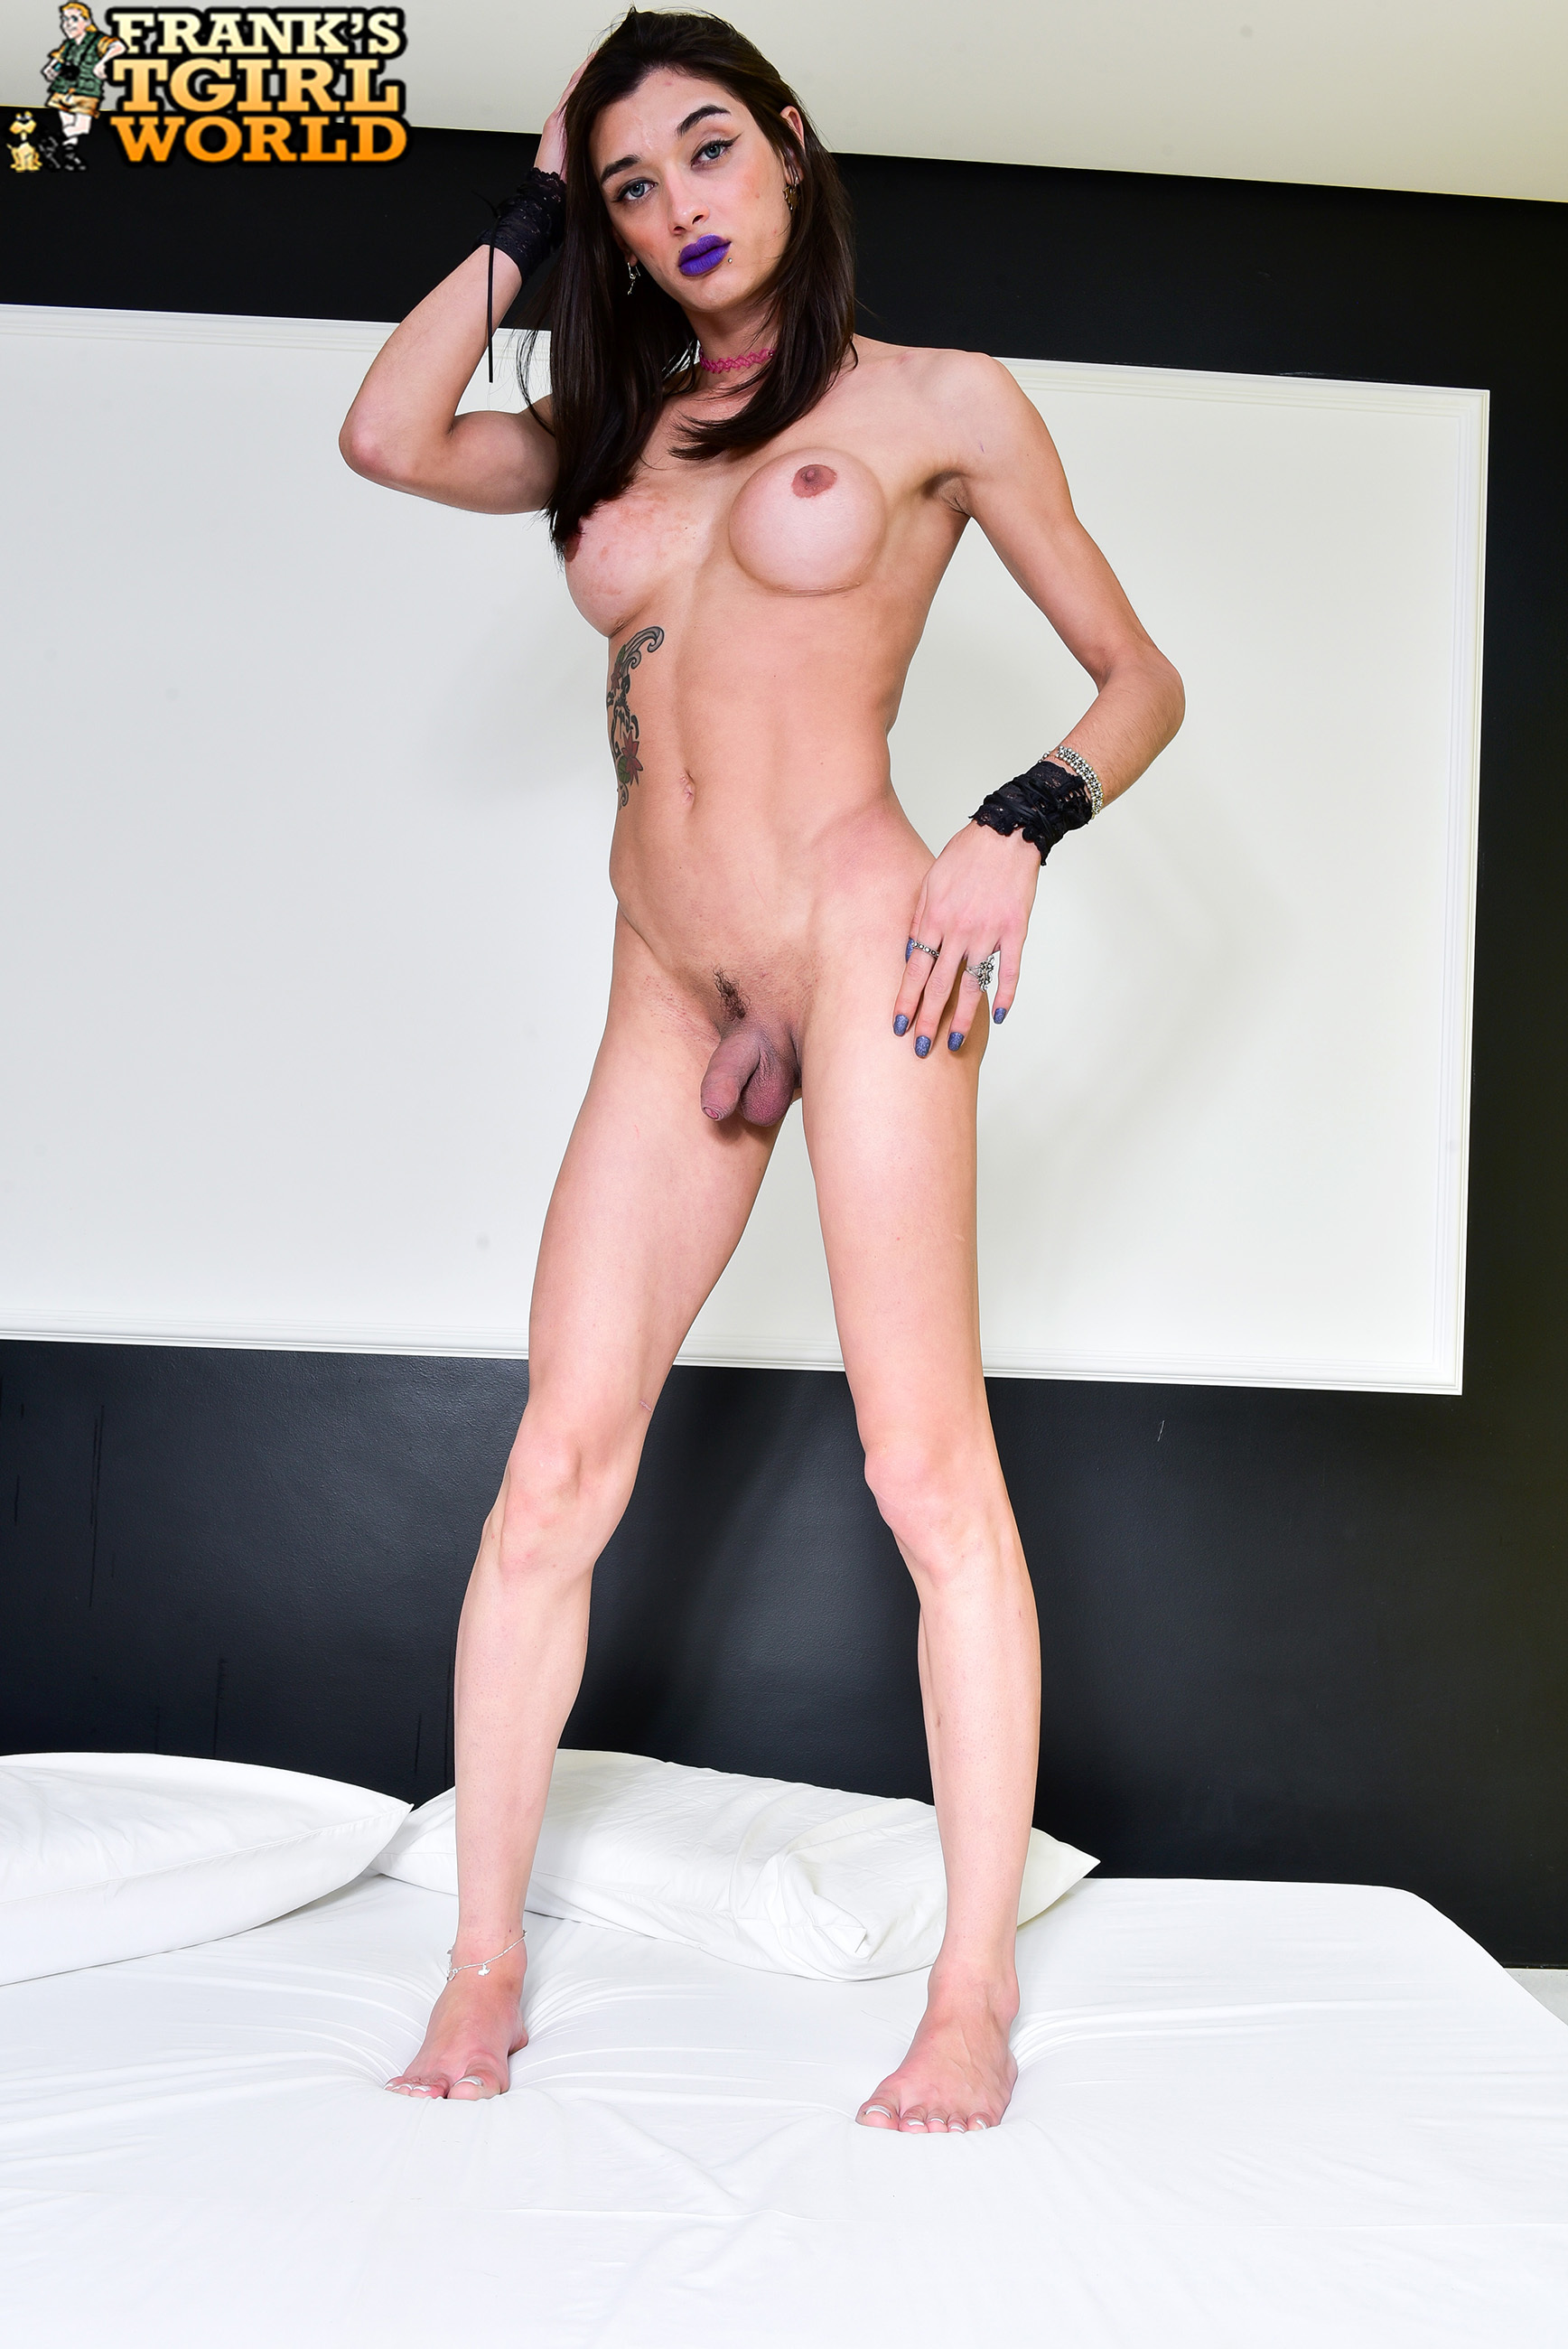 Jessica Angel's Sperm Shooting Debut!